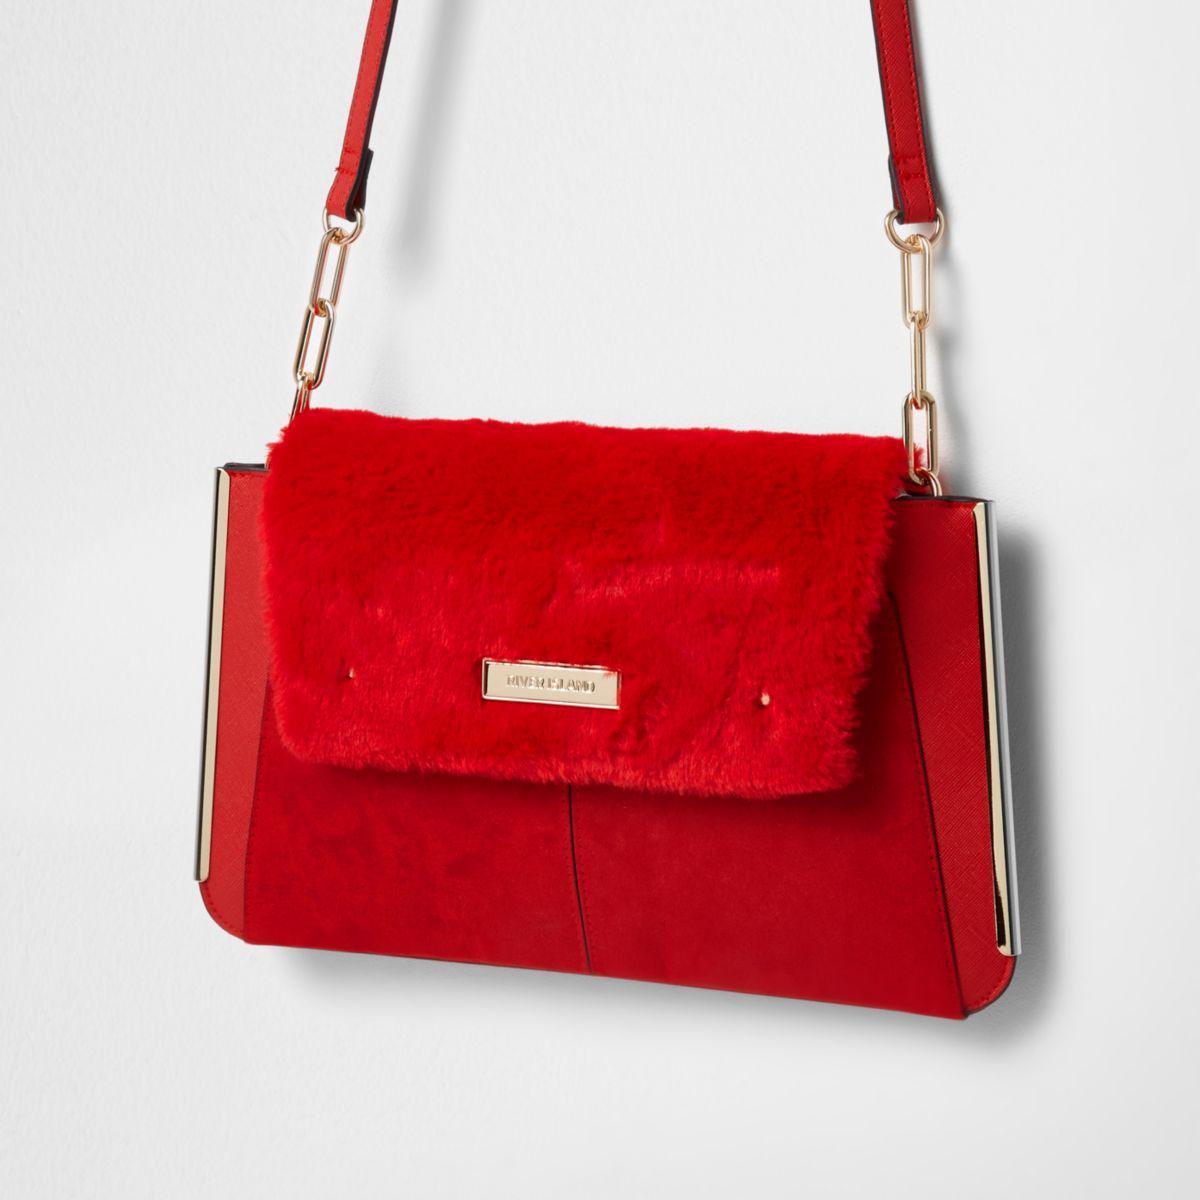 9895b9414047 Lyst - River Island Red Faux Fur Flap Envelope Clutch Bag Red Faux ...